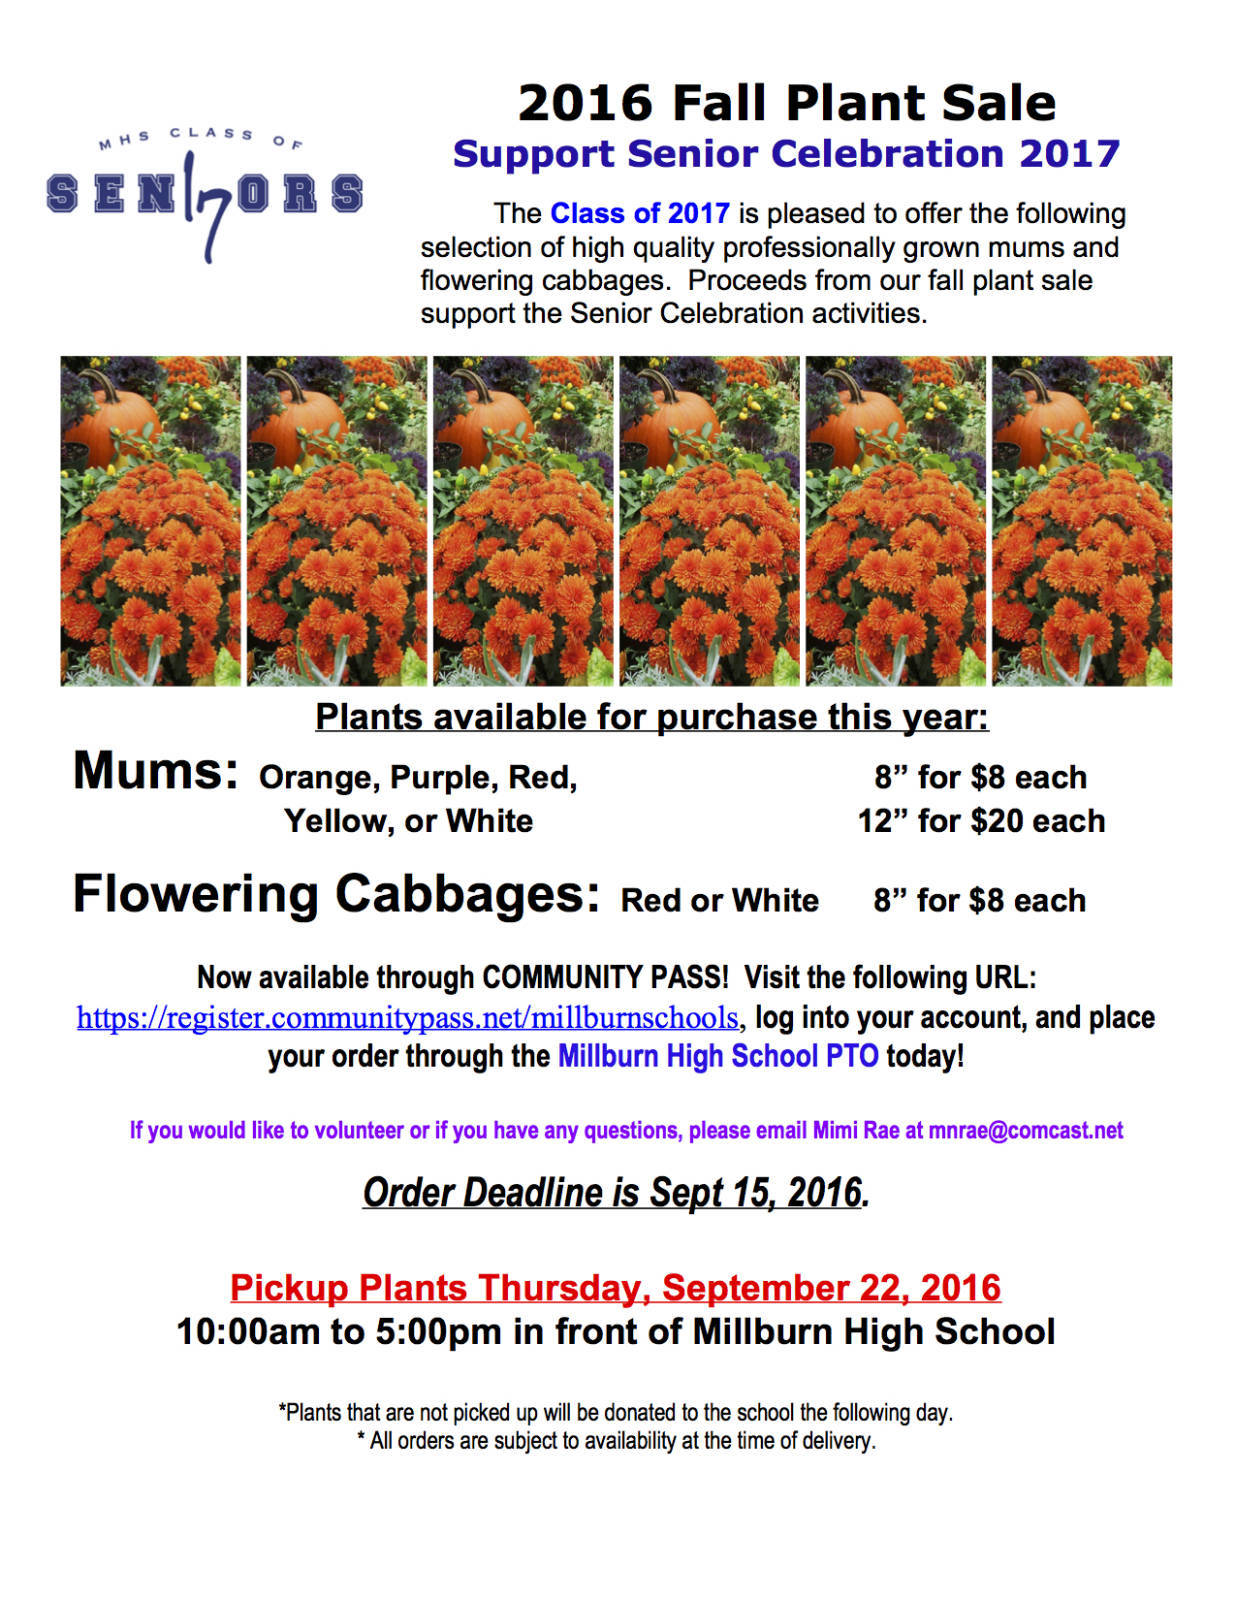 MHS Senior Celebration Plant Sale Order Fall Plants Now News TAPinto